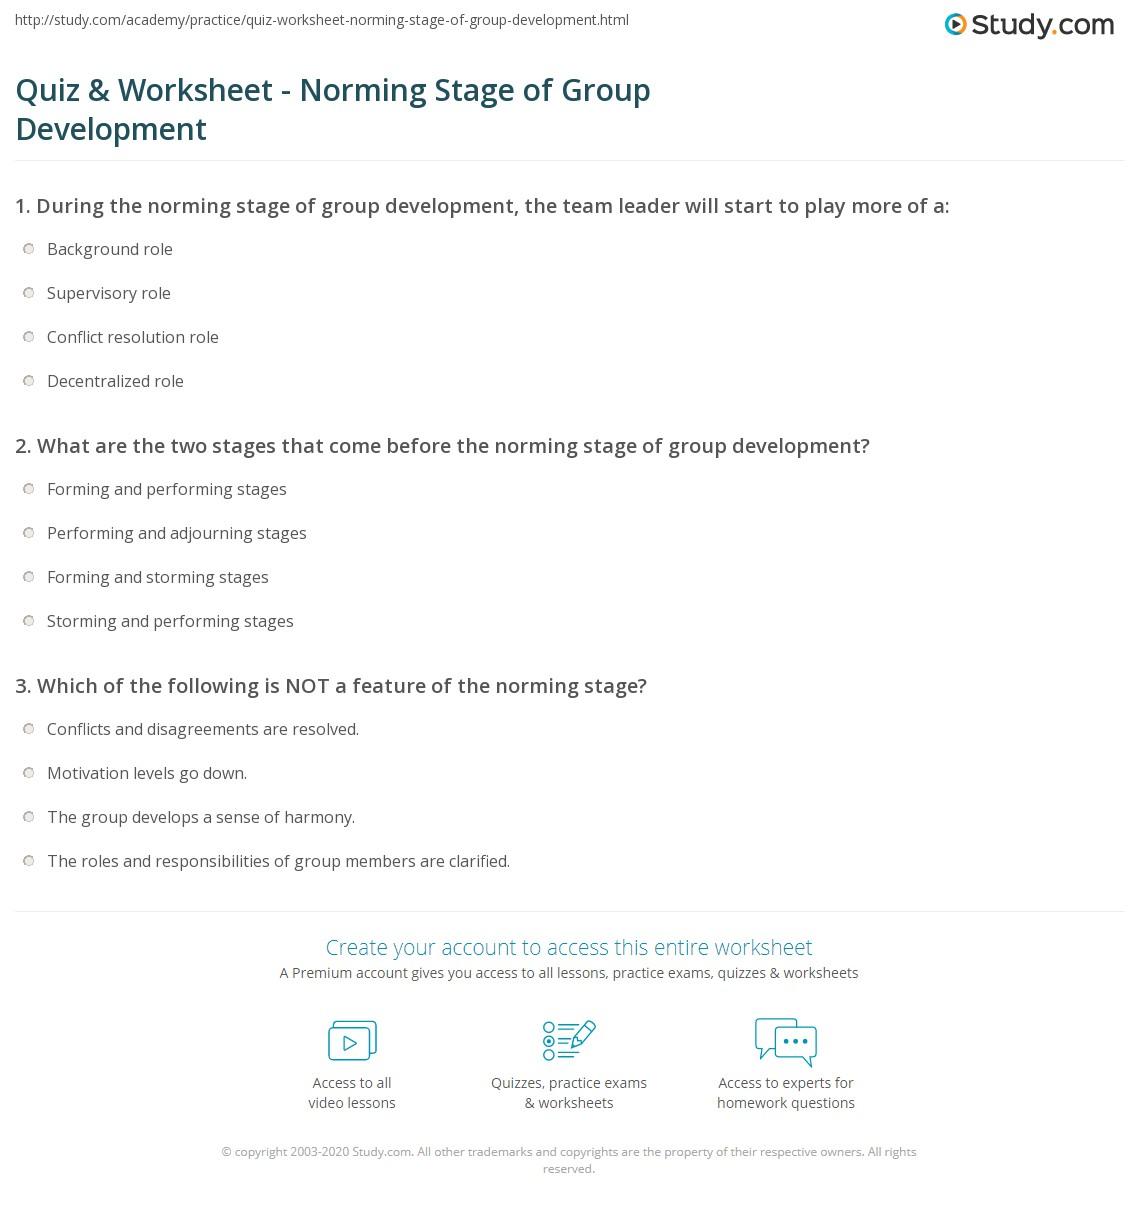 quiz worksheet norming stage of group development com print norming stage of group development definition explanation worksheet